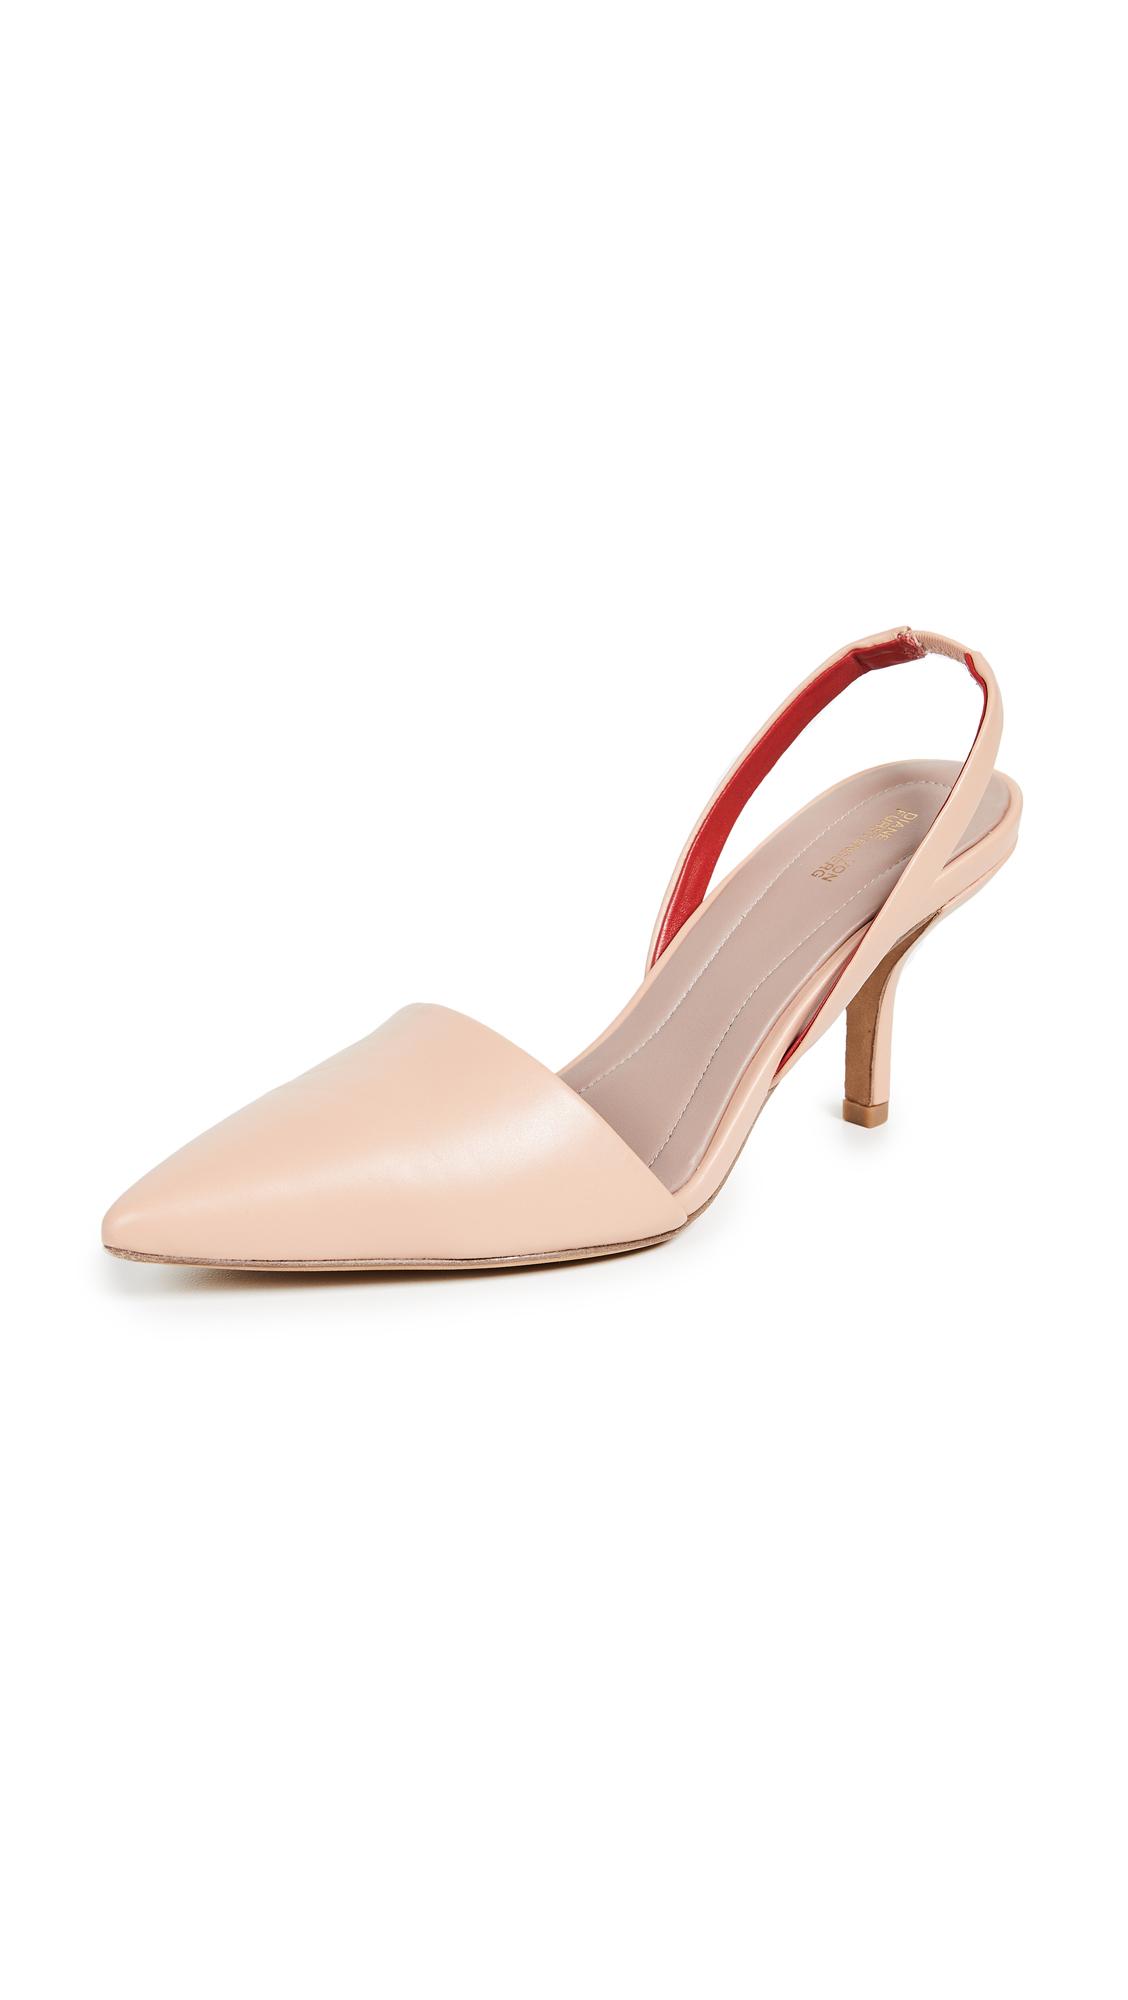 Diane von Furstenberg Mortelle Slingback Pumps - Pink Sand